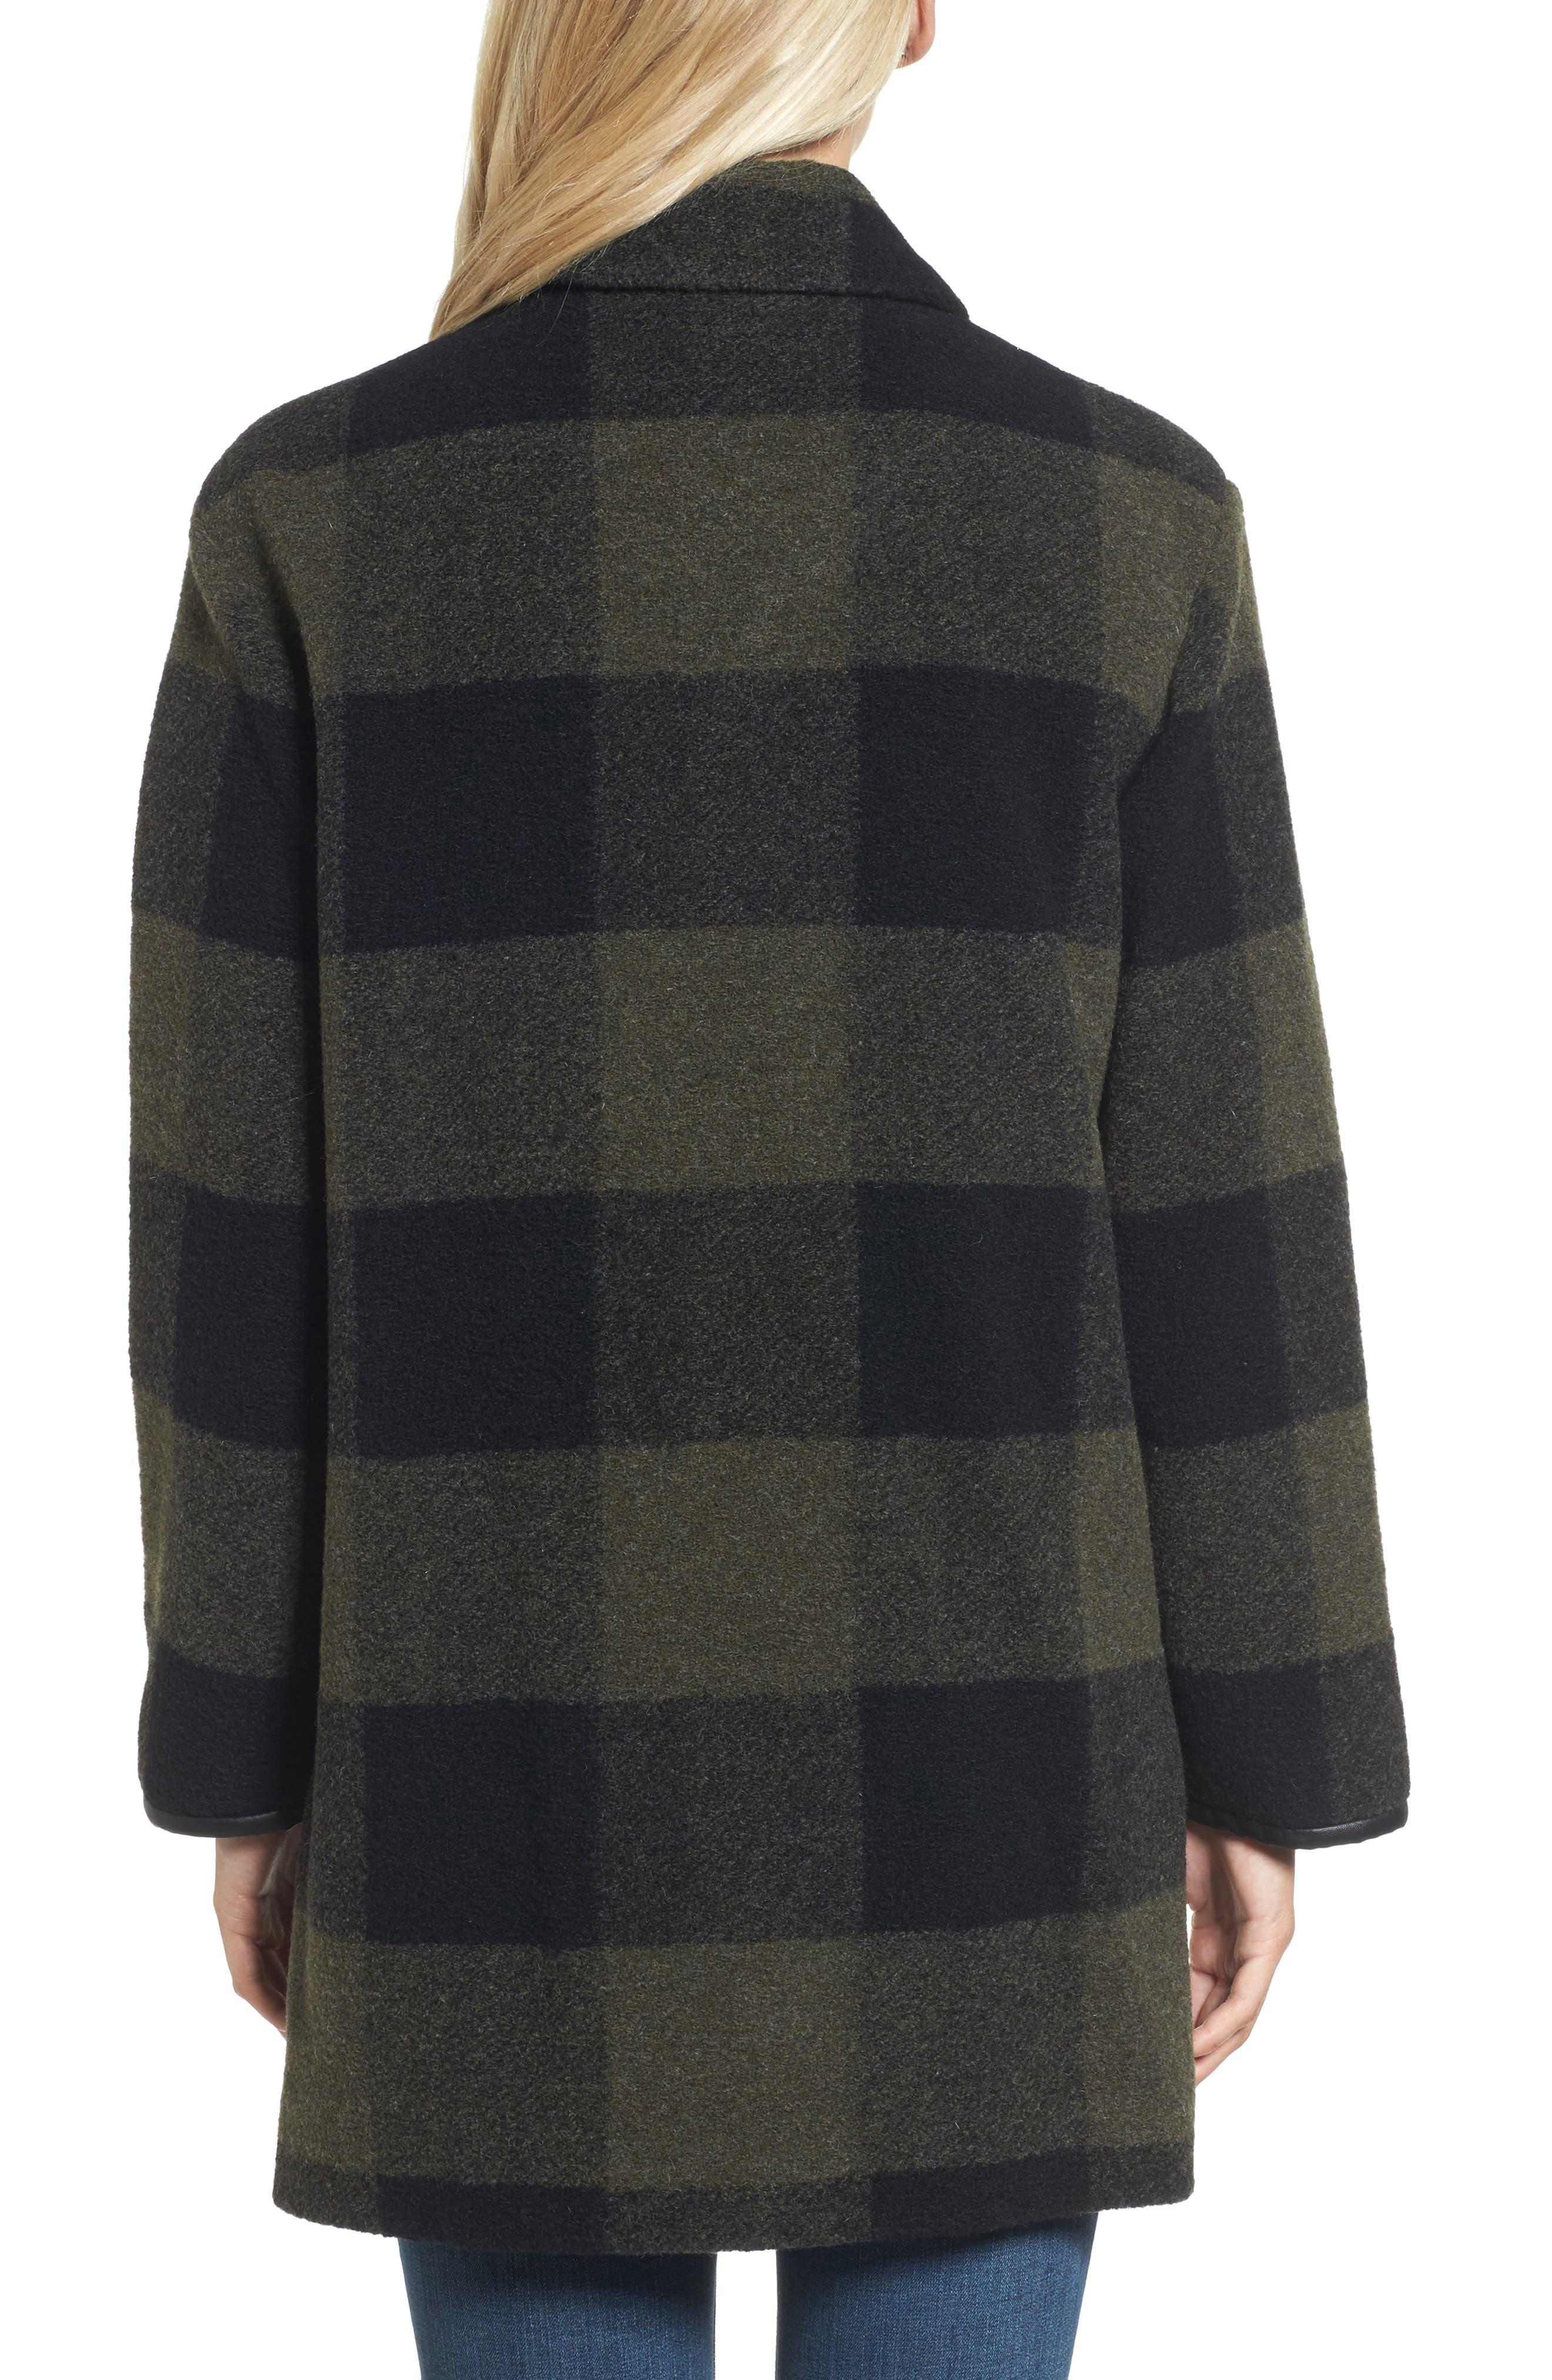 Paul Bunyan Plaid Wool Blend Barn Coat,                             Alternate thumbnail 2, color,                             Olive/ Black Plaid